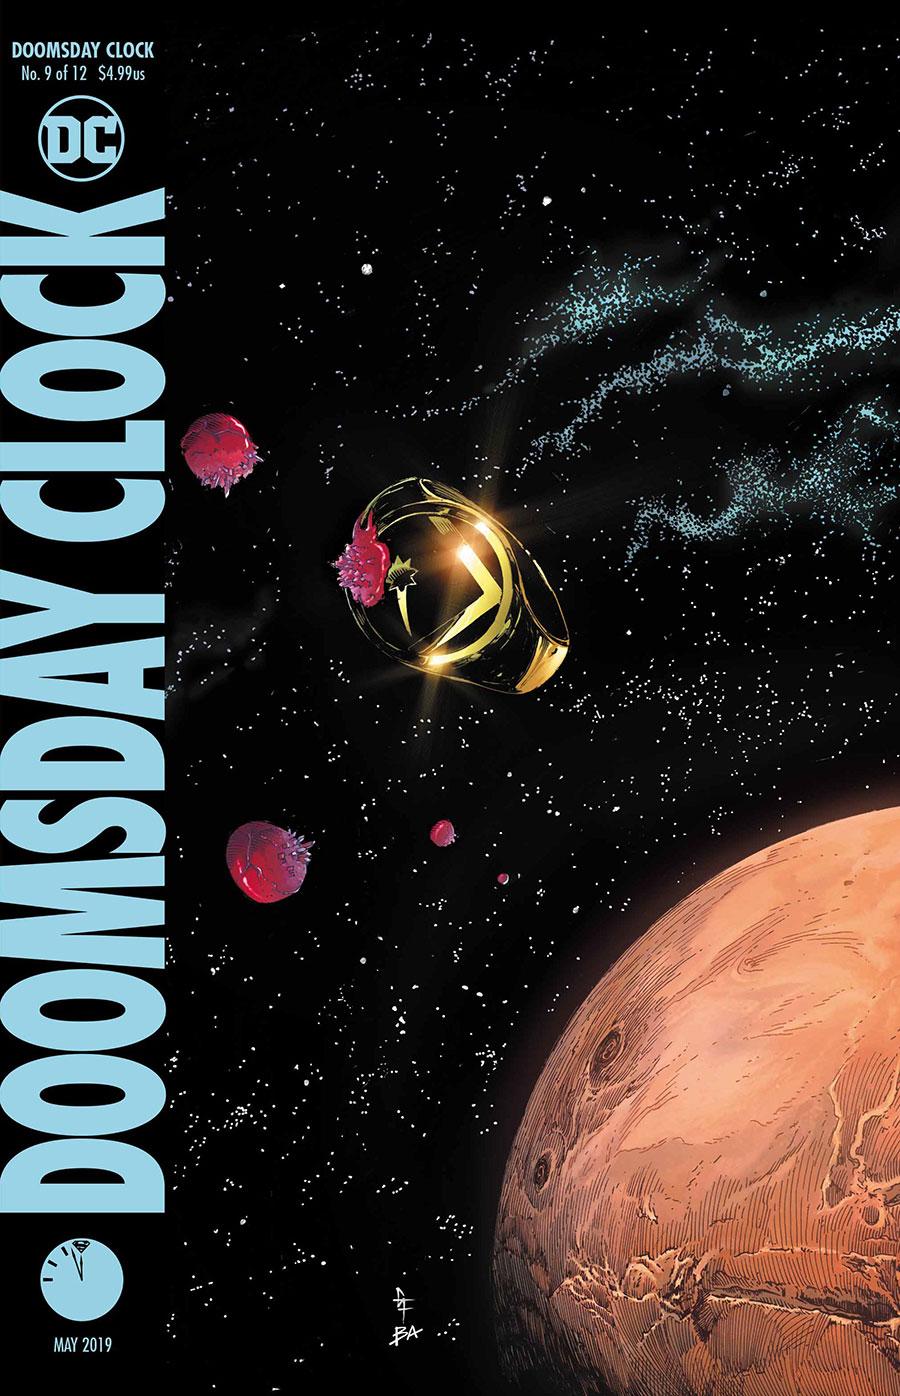 Doomsday Clock Cover 9